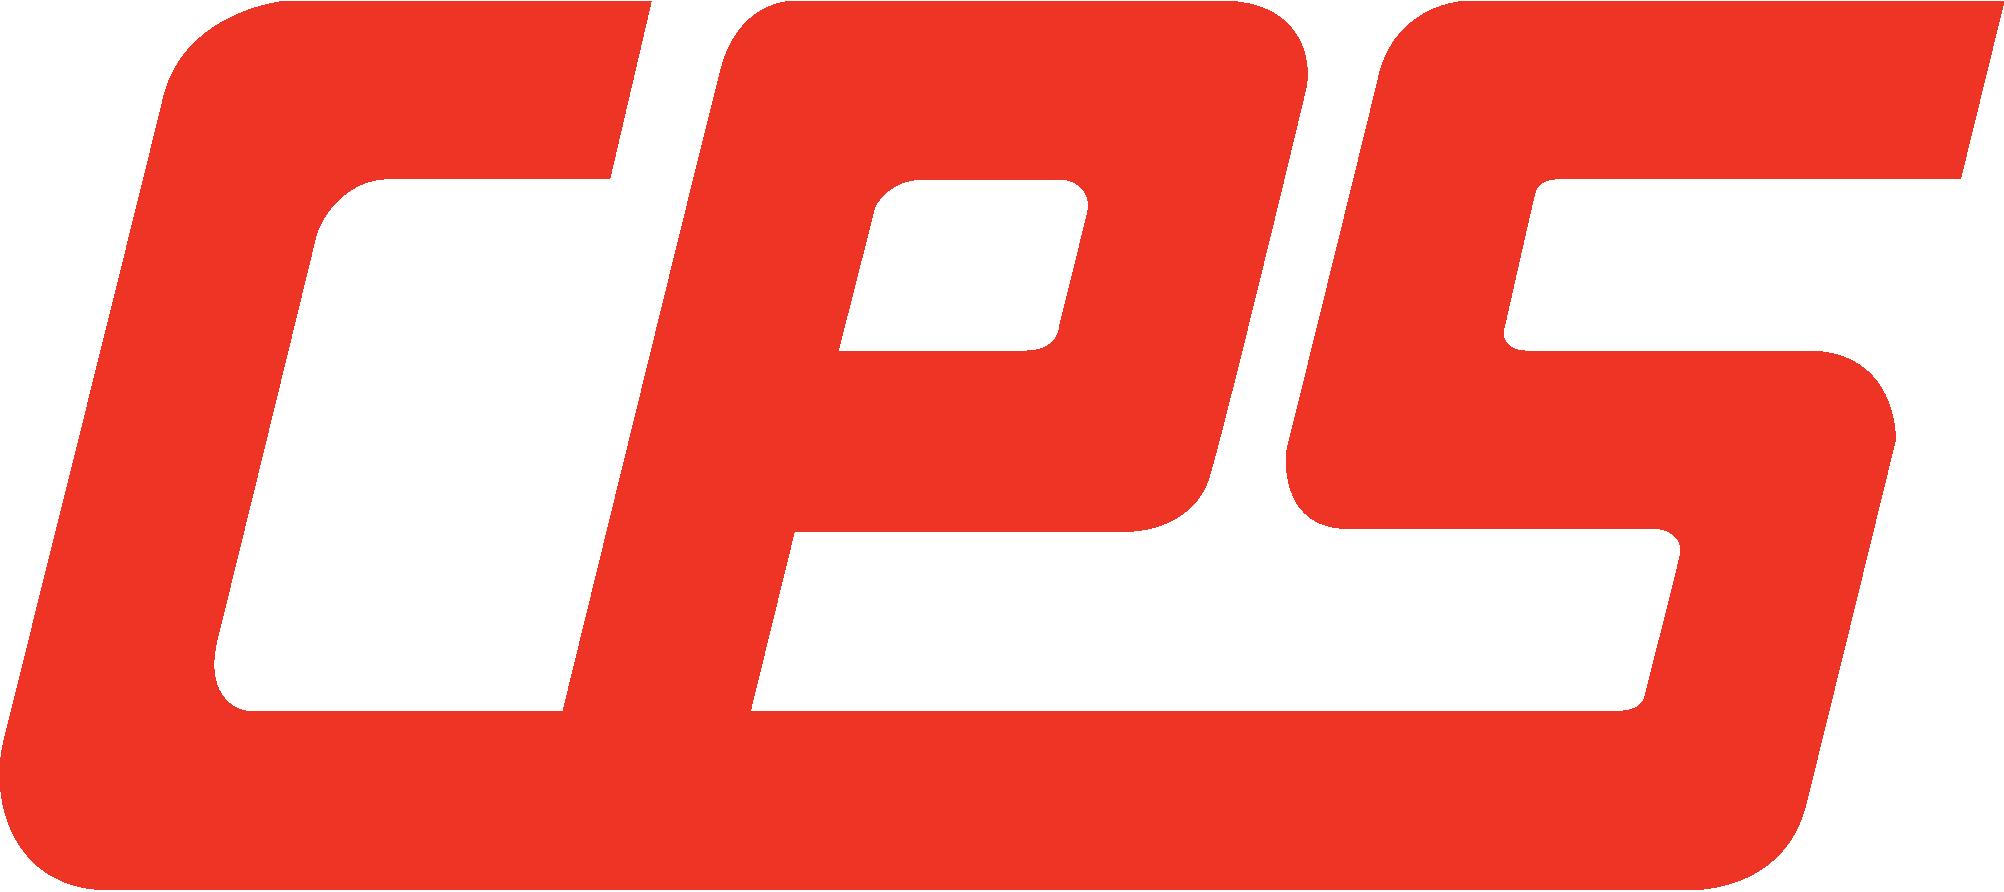 cps logo high res